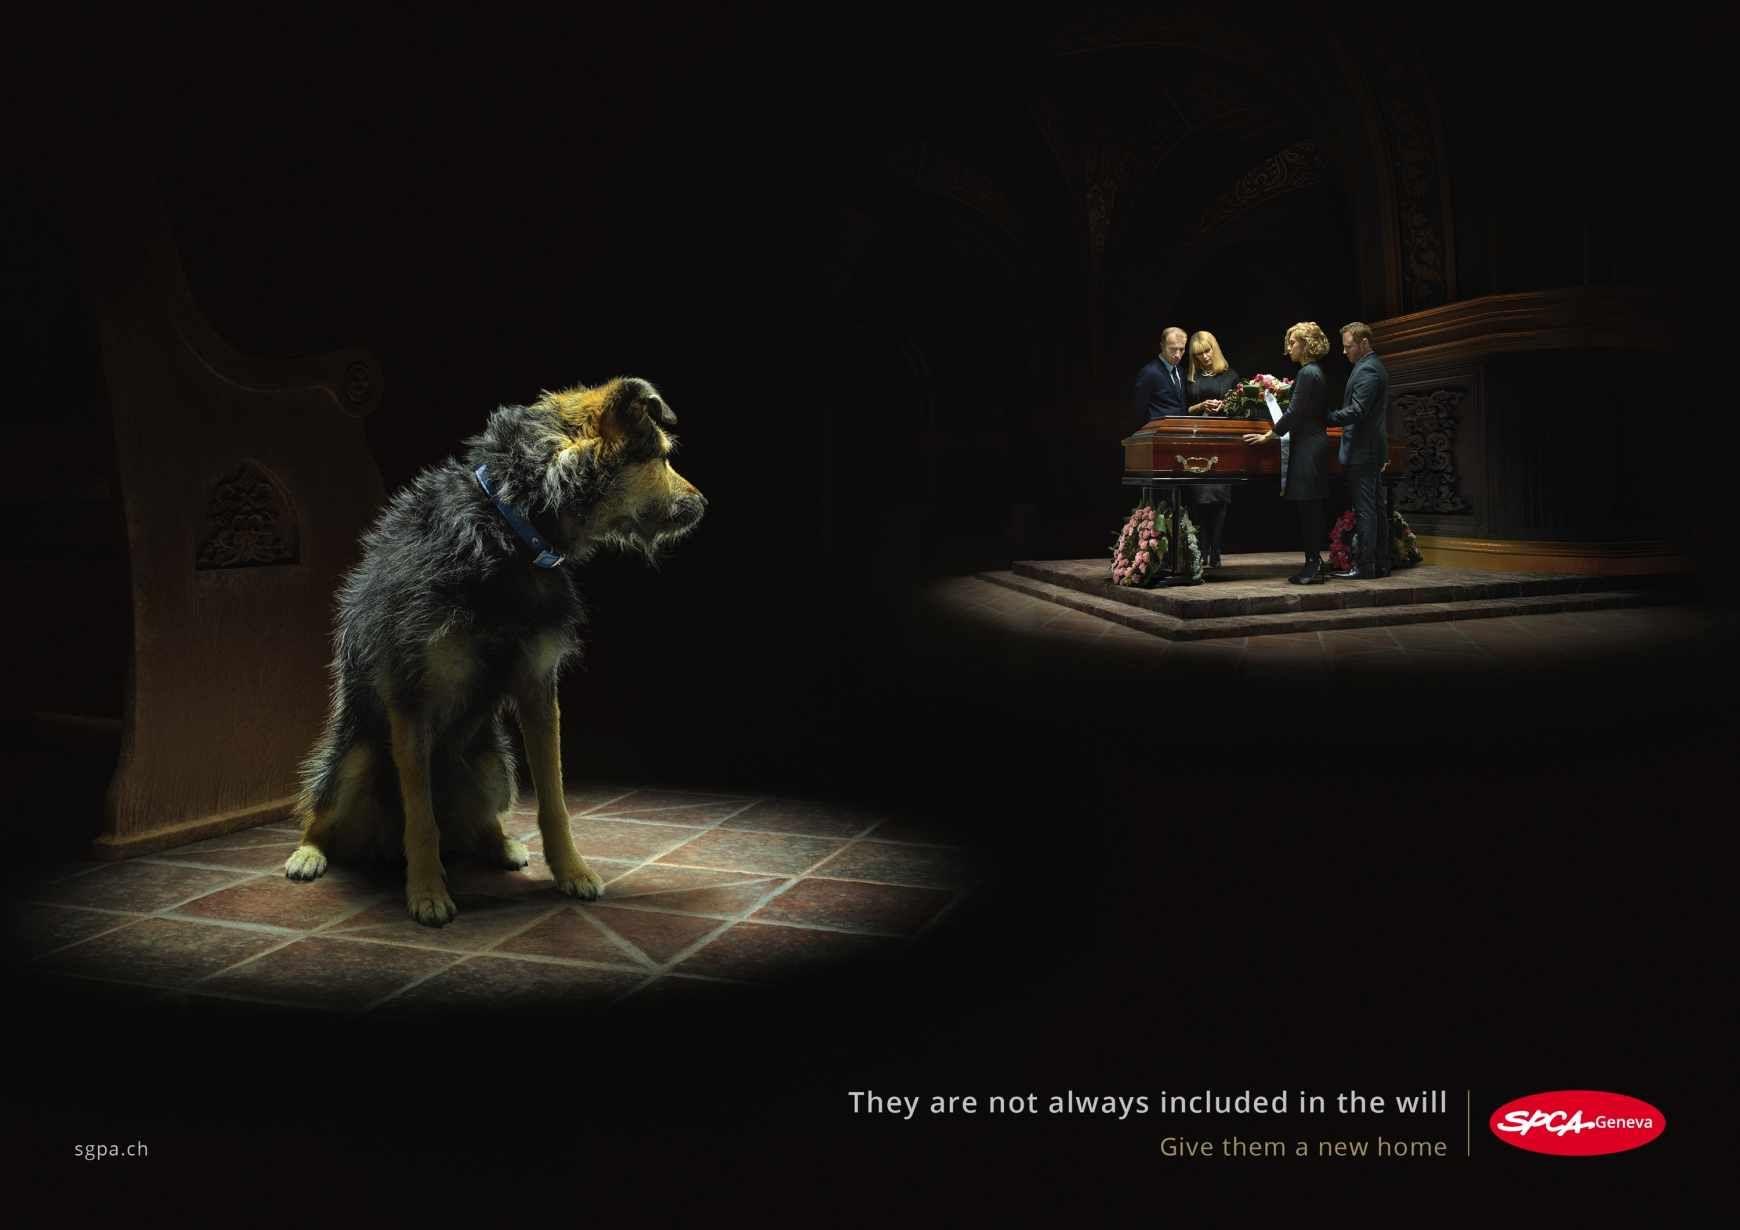 SPCA: Death